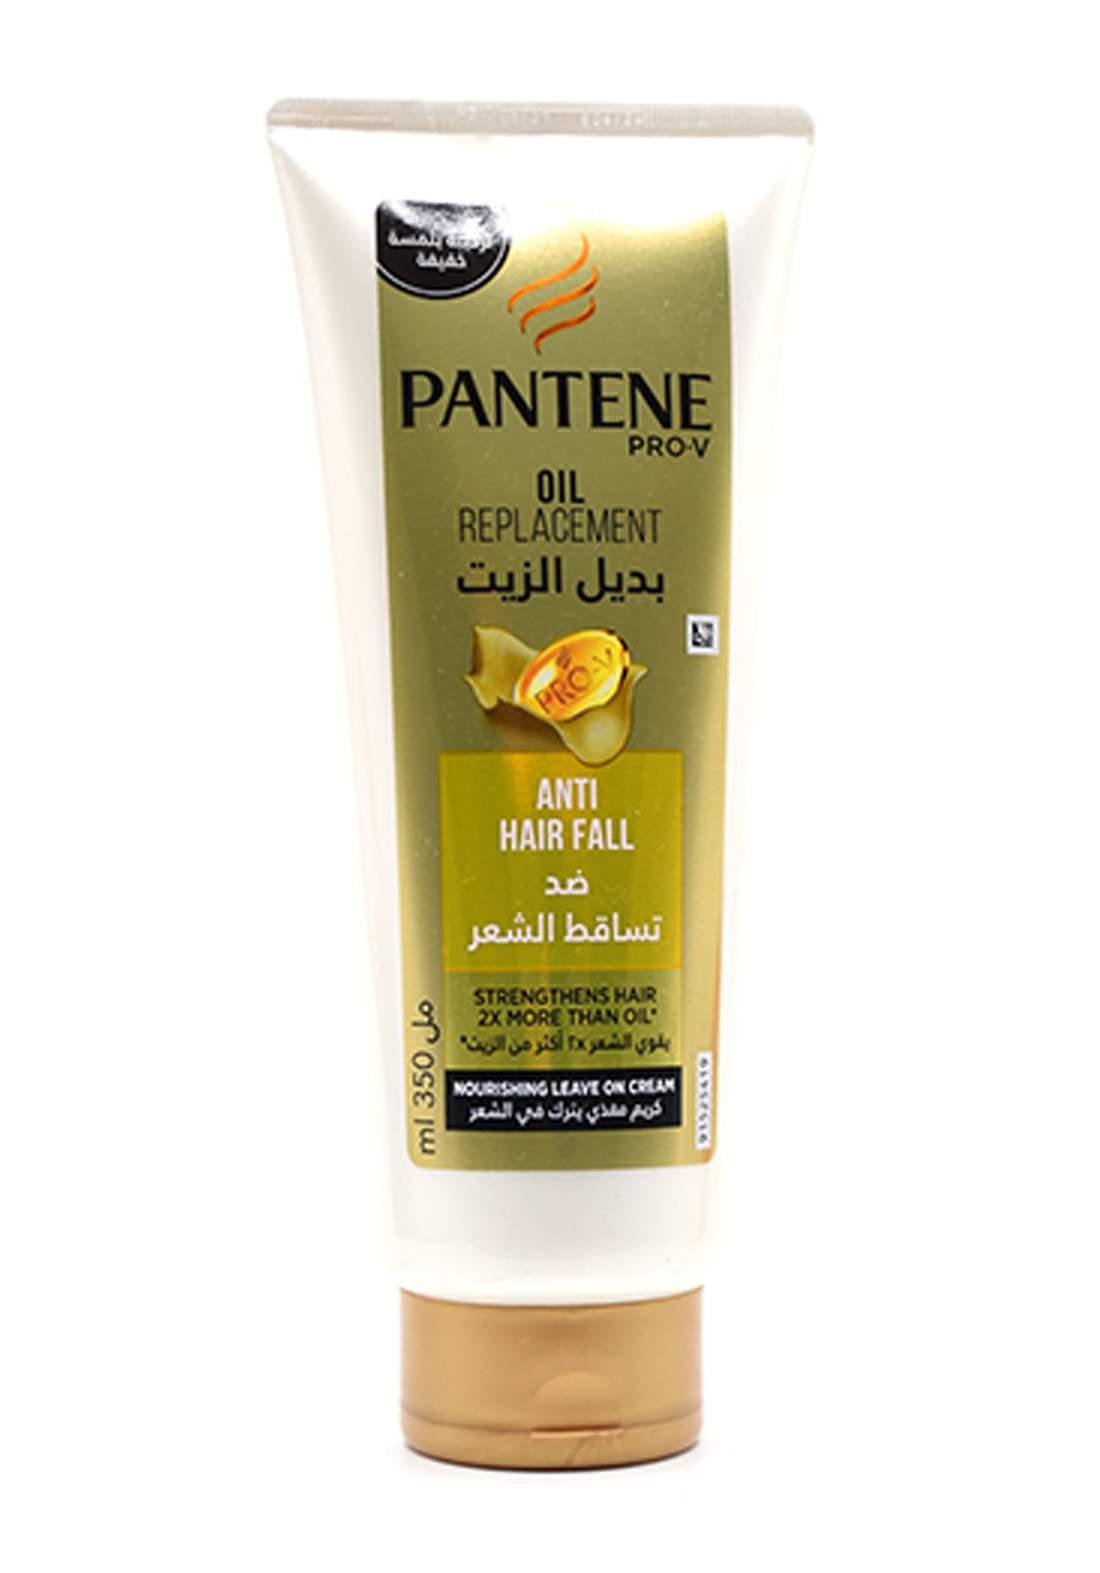 Pantene Pro-V Anti Hair Fall Oil Replacement - 350 ml  كريم بديل الزيت